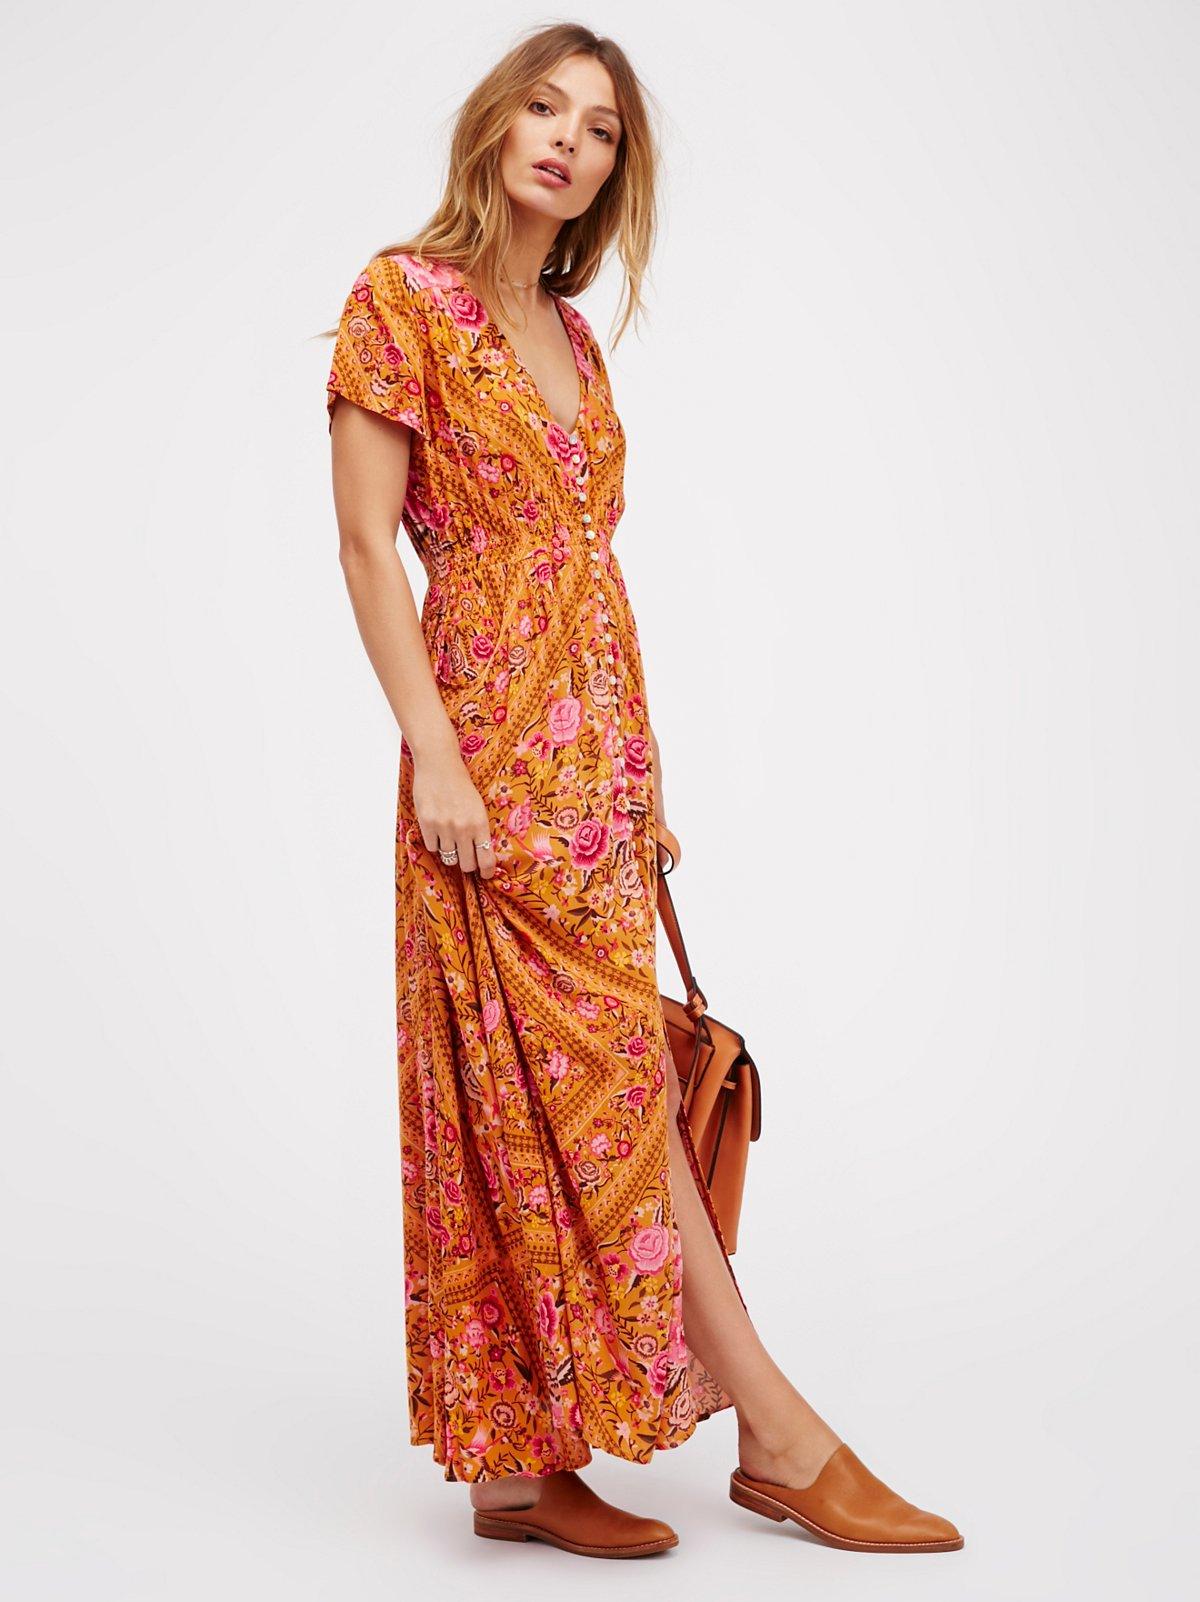 Babushka Gown